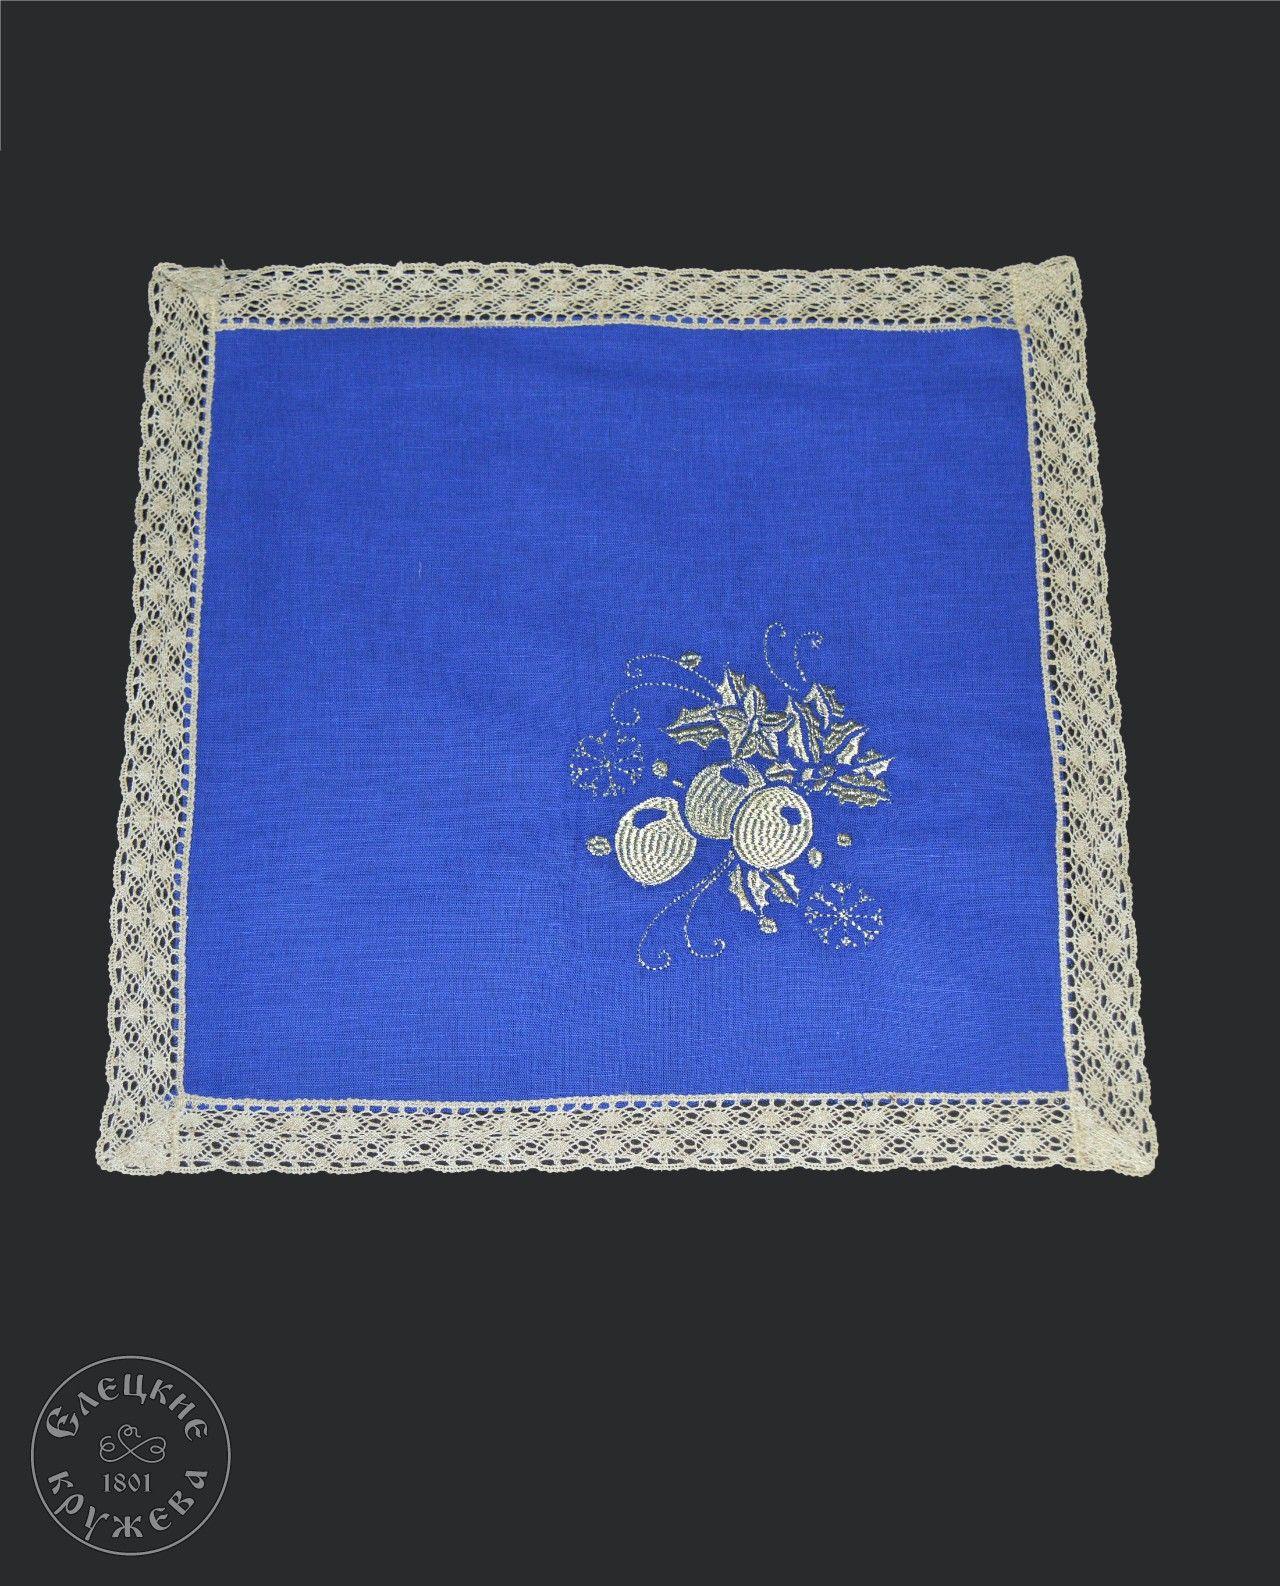 Yelets lace / Linen napkin С 11735Ц